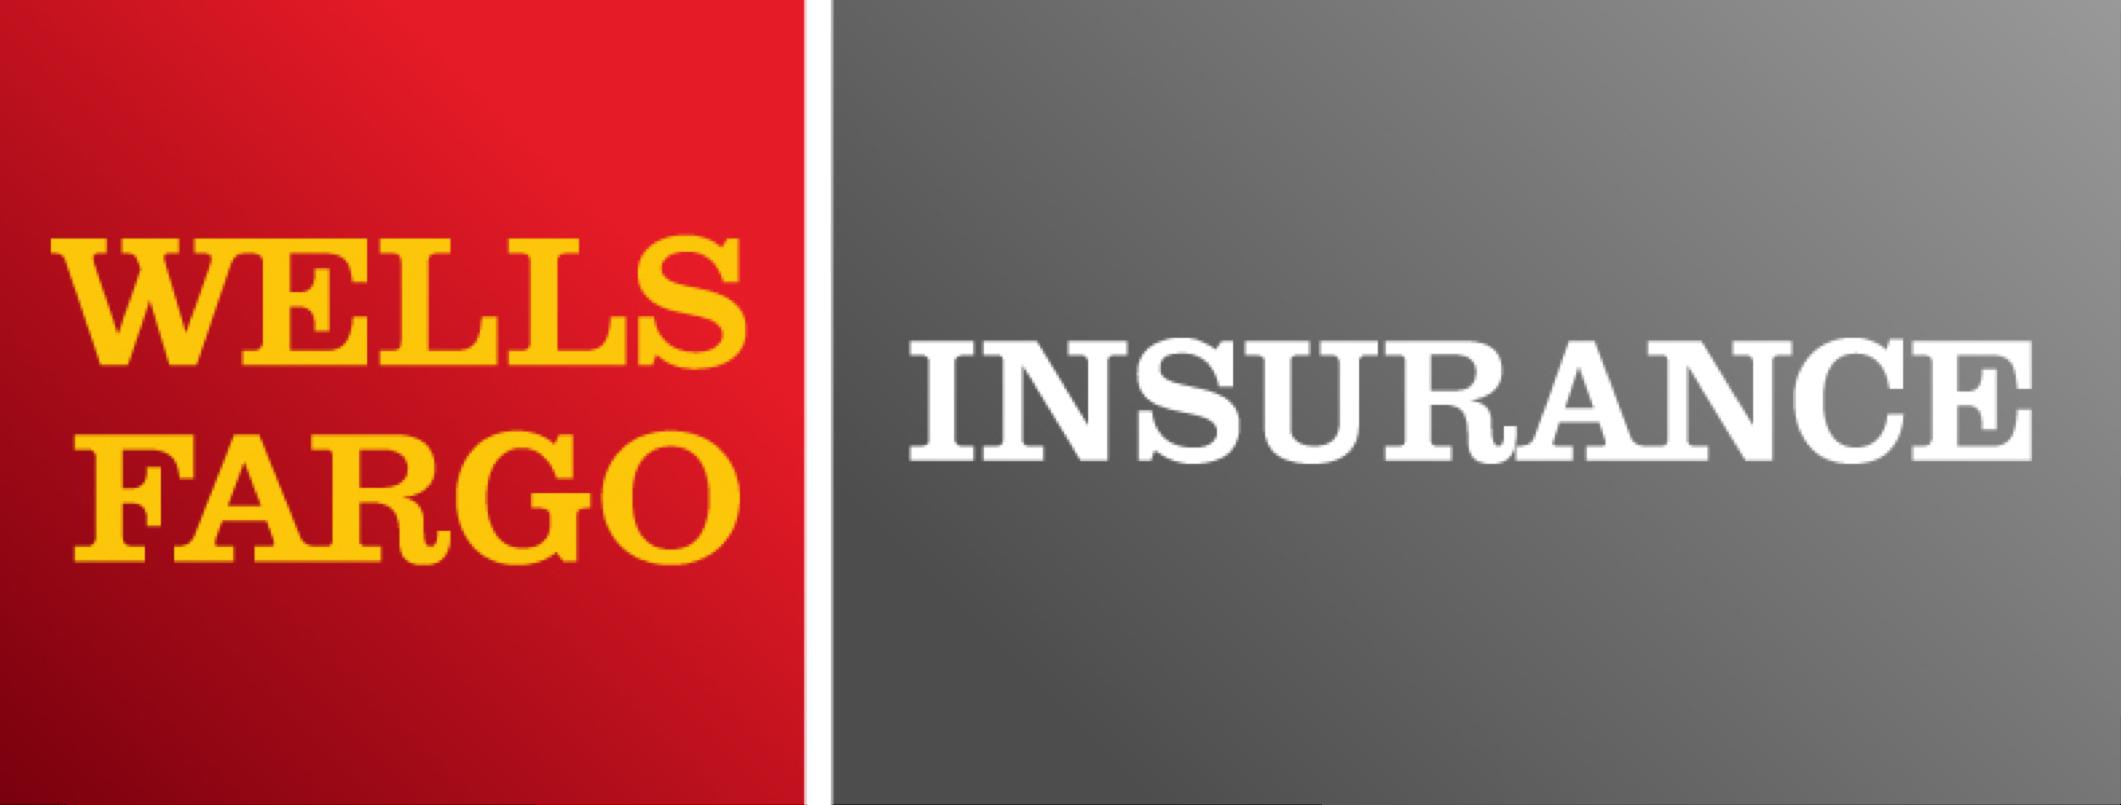 Wells Fargo Insurance